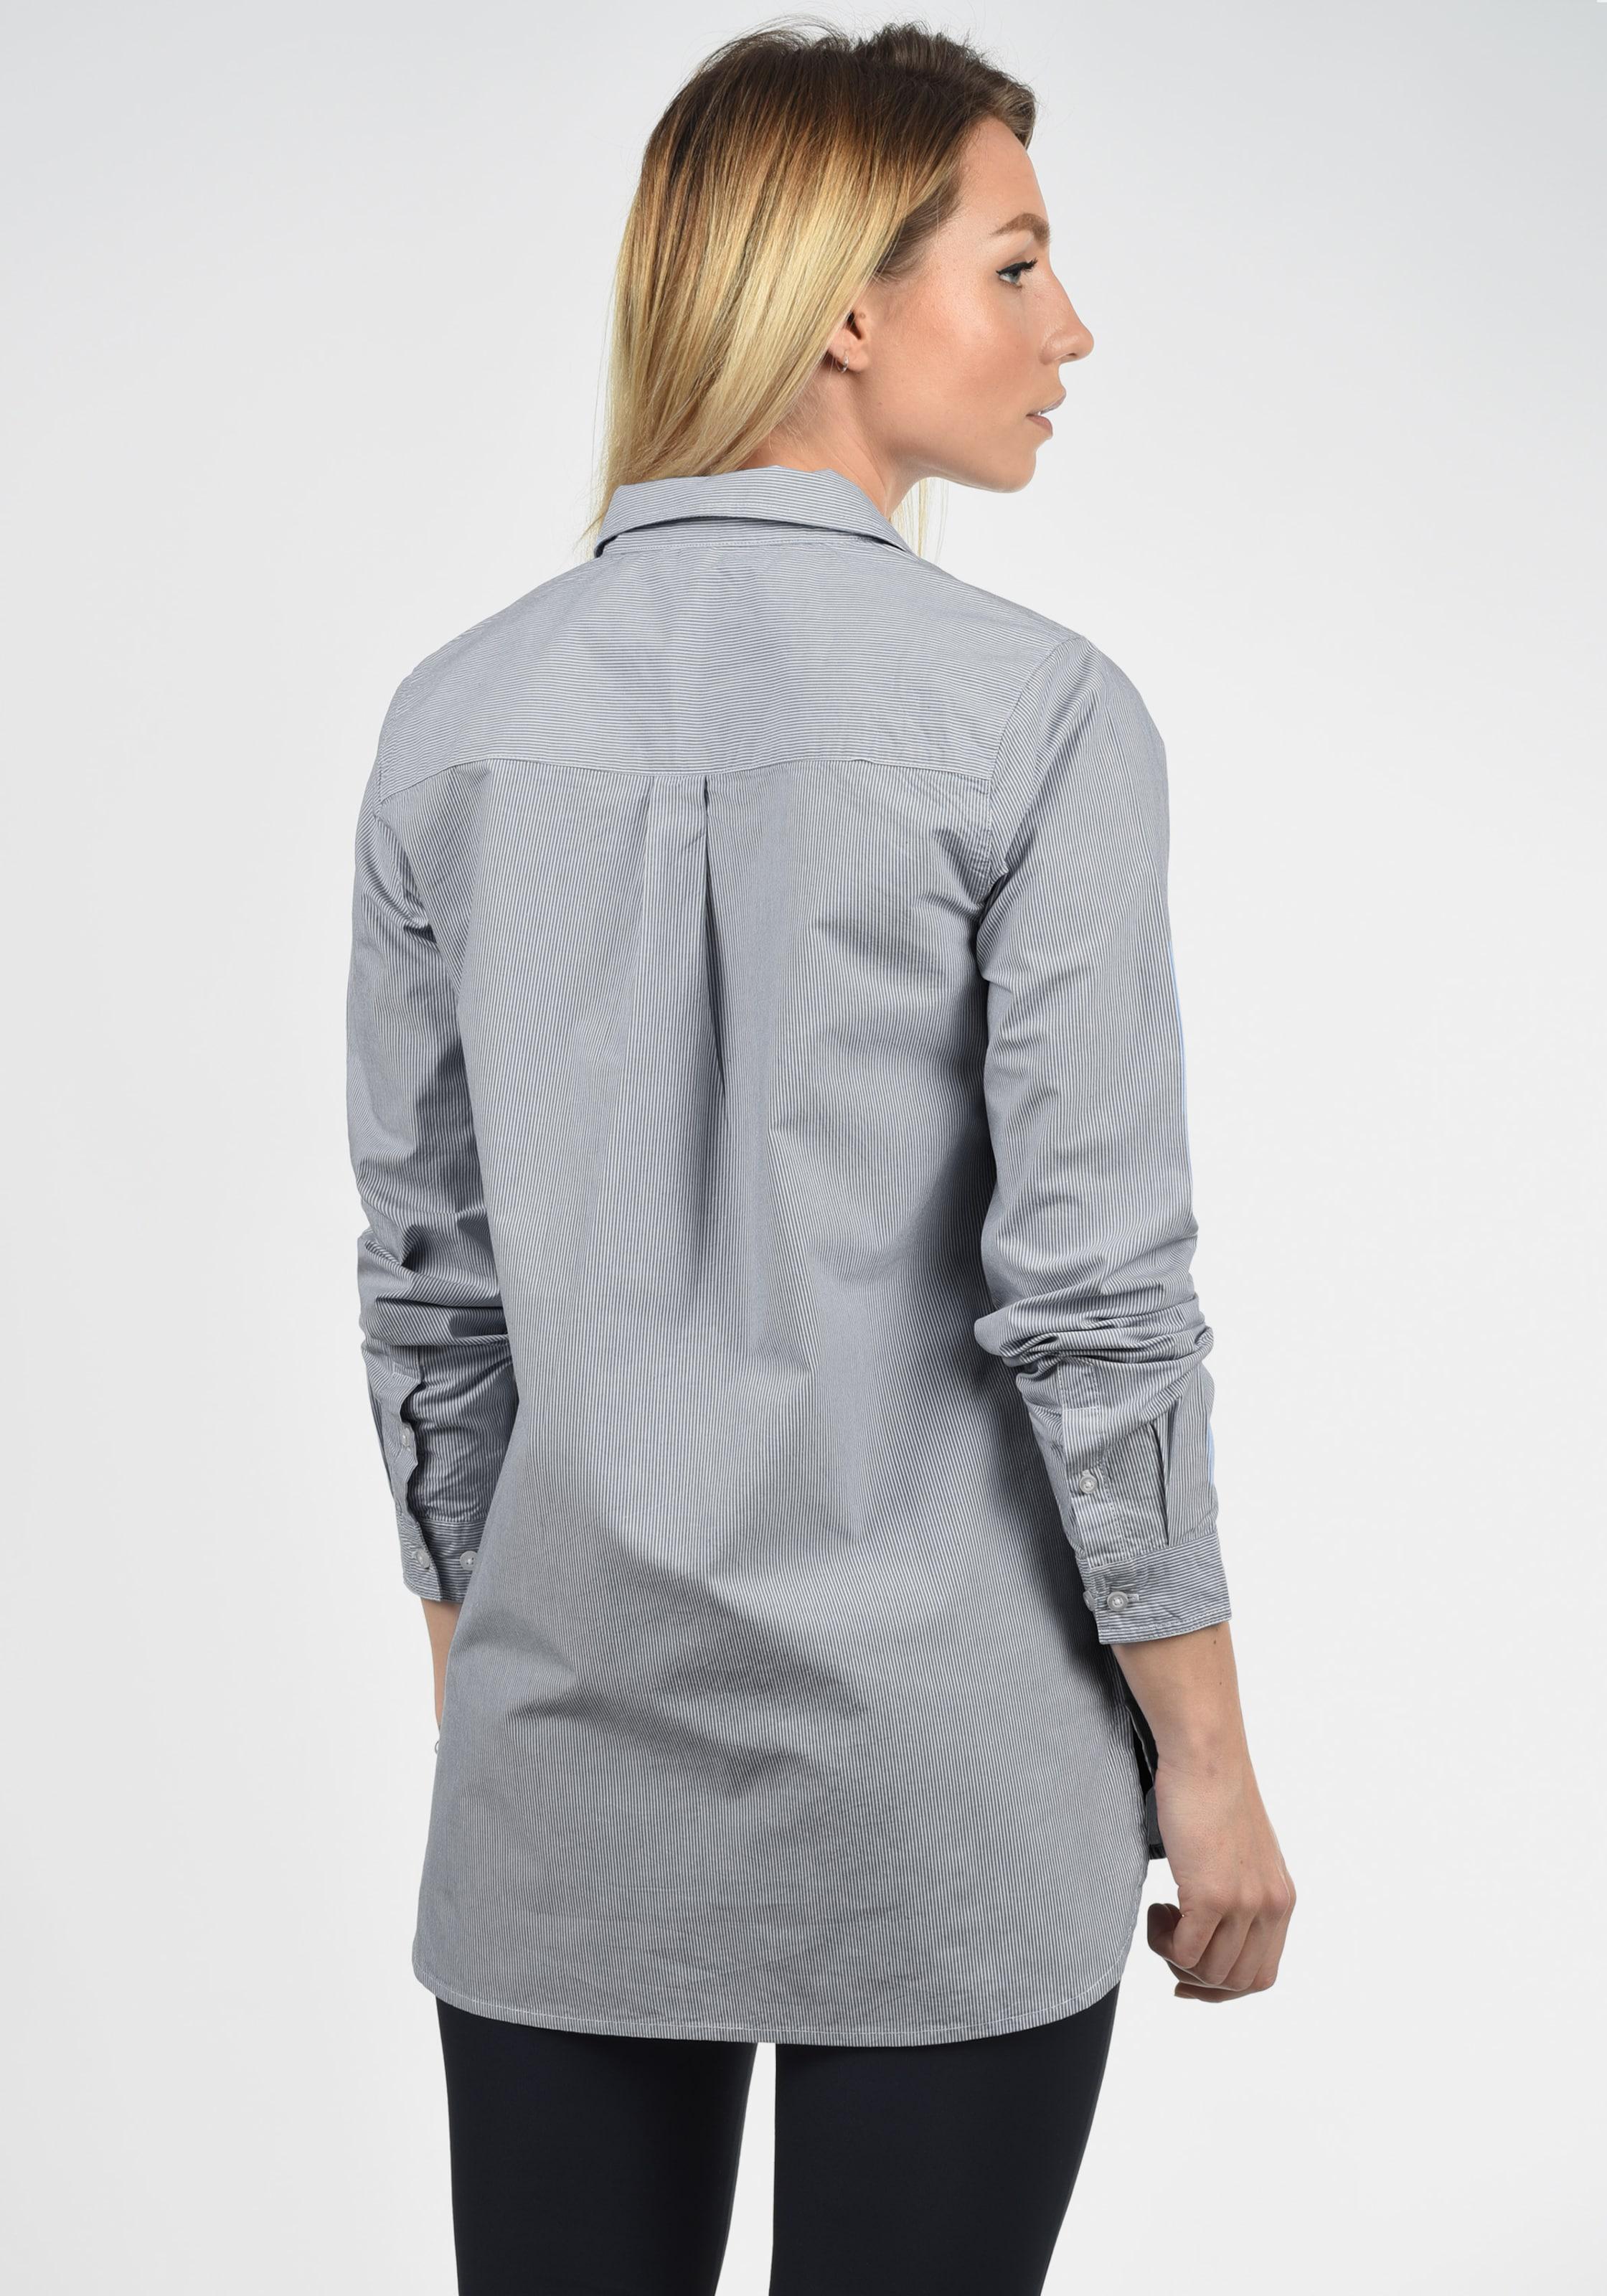 'drina' In Desires Hemdbluse BlauWeiß ulFKc1J3T